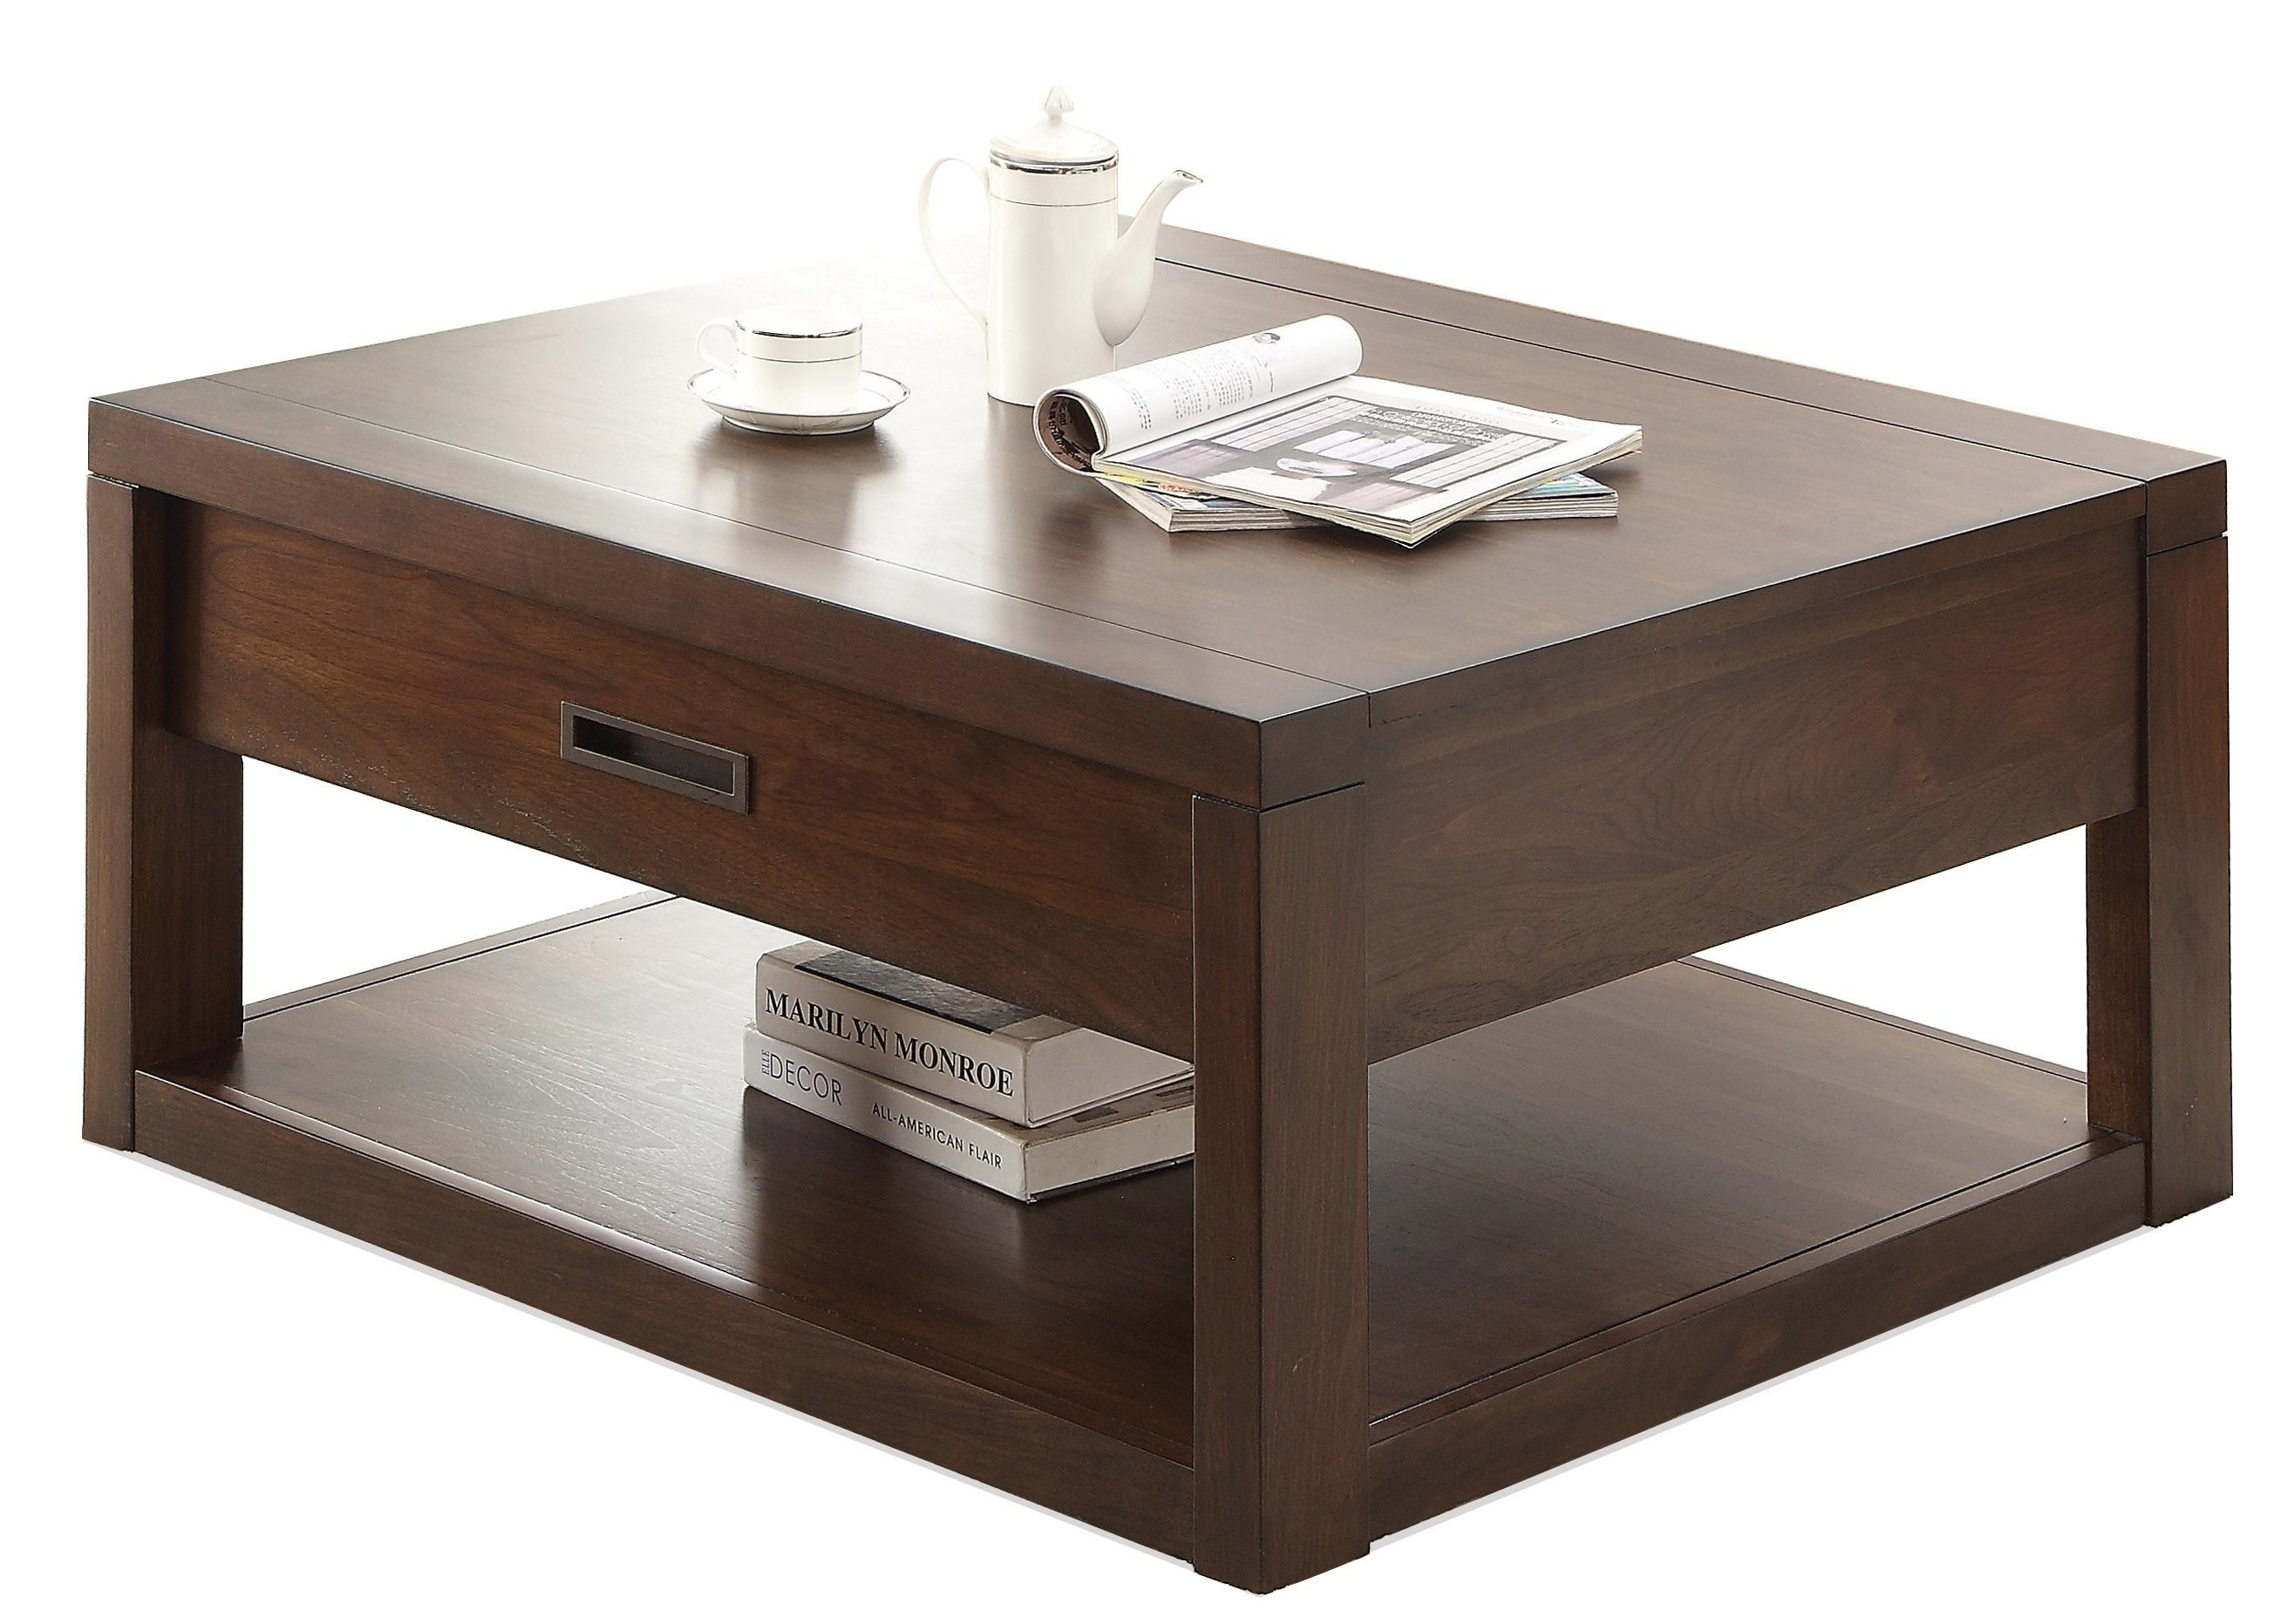 Riverside Furniture Riata Square Cocktail Table W/ Casters